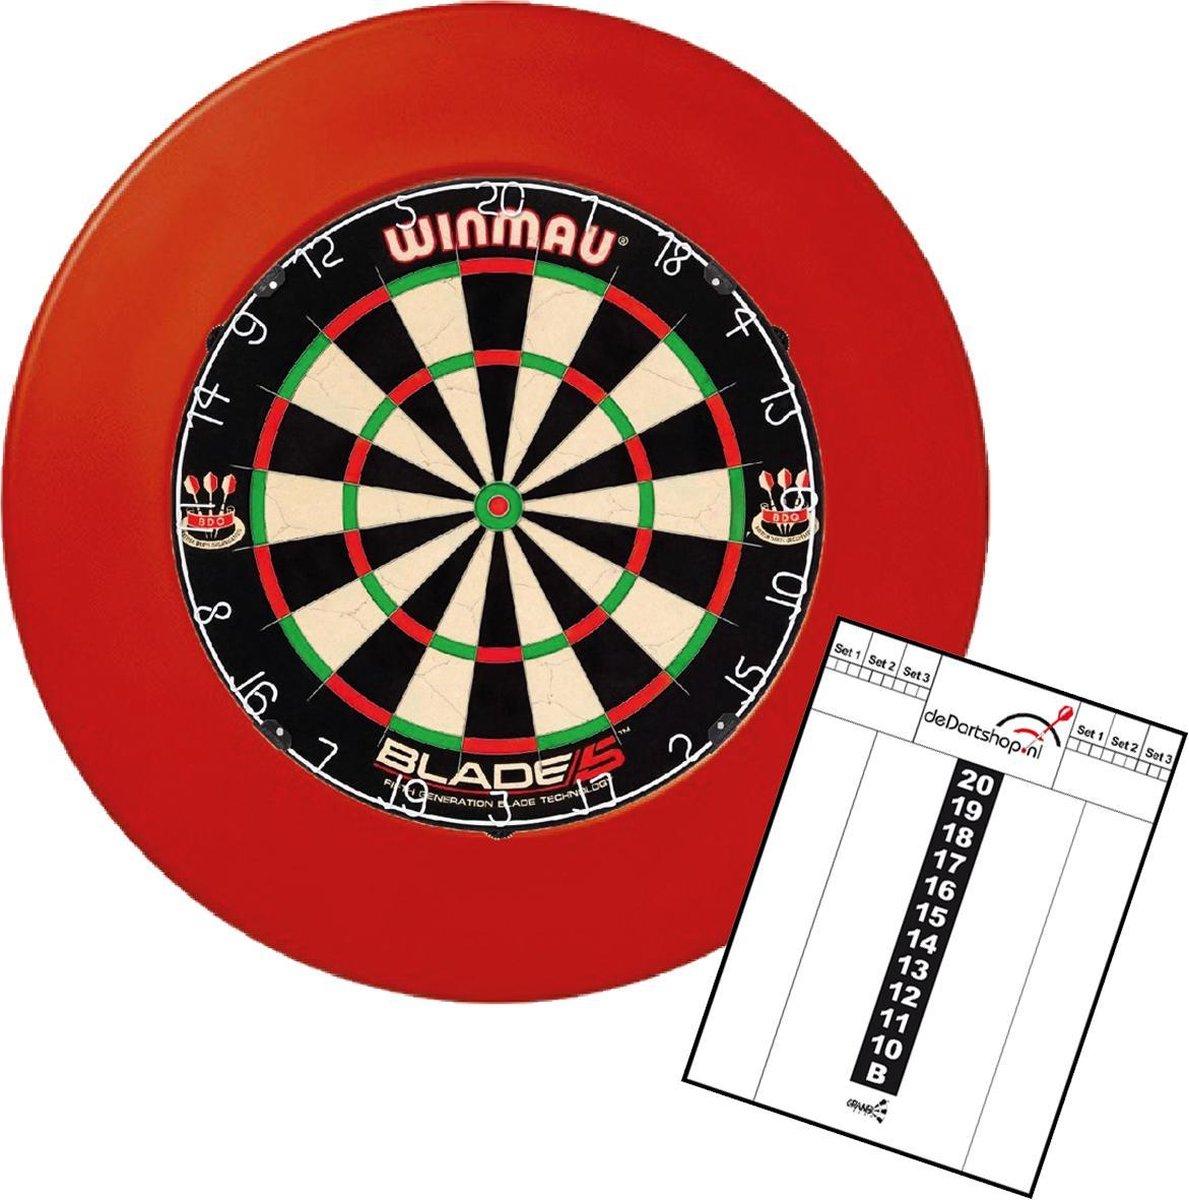 winmau blade 5 incl. rubberen surround ring rood en scorebord